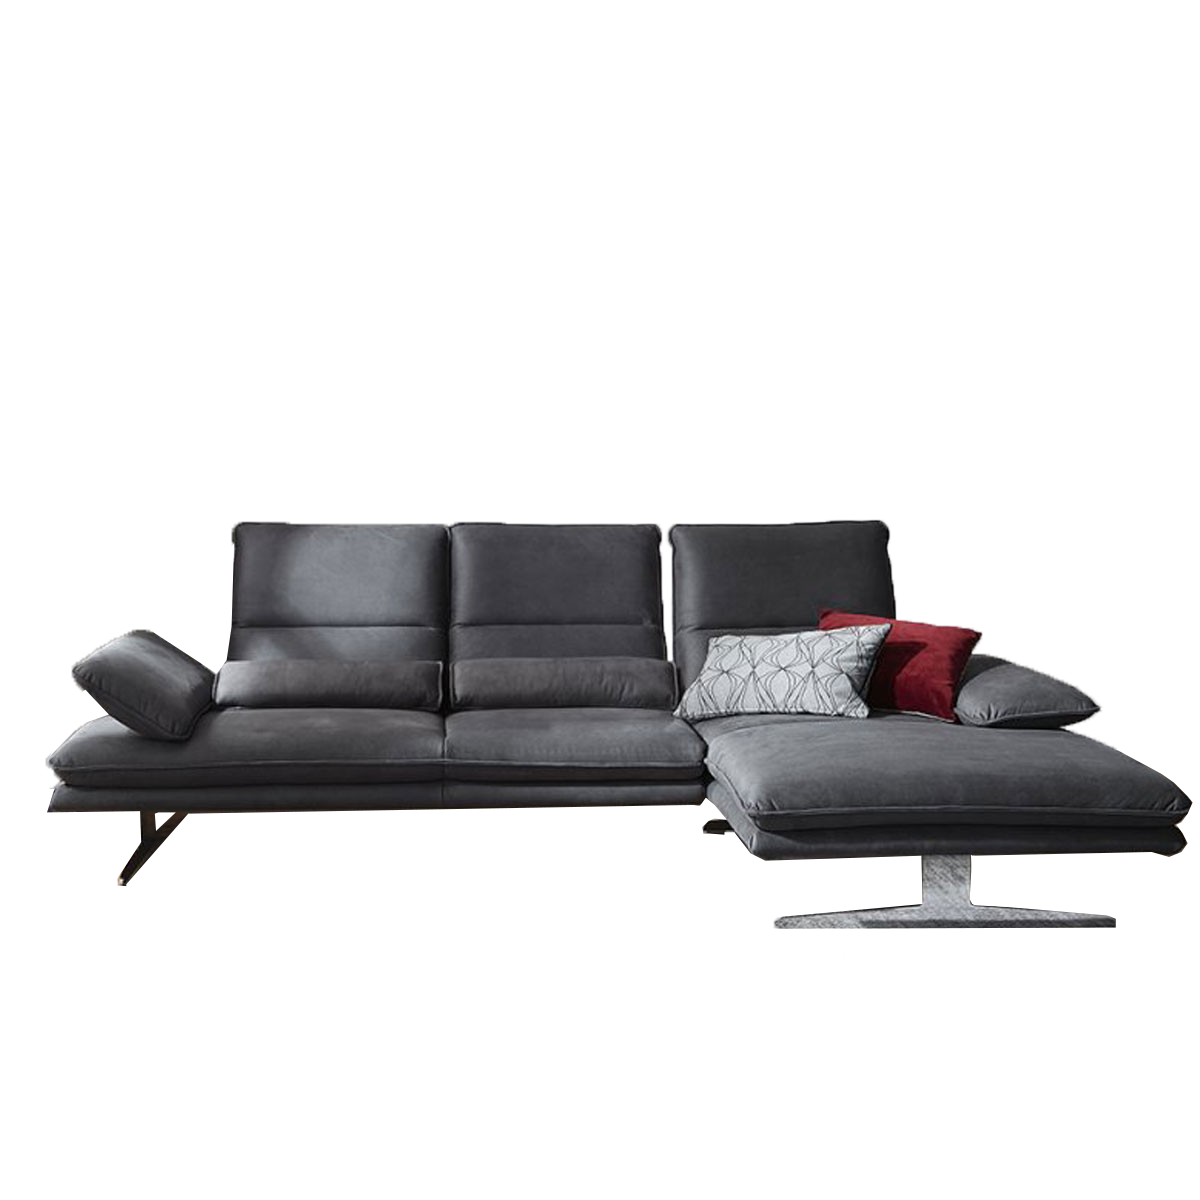 Full Size of Schillig Sofa W Online Kaufen Couch Sherry Ewald Leder Broadway Gebraucht Alexx Outlet Preis Willi Ecksofa 16777 Im Reprsentativen Stoffbezug Sofa Schillig Sofa